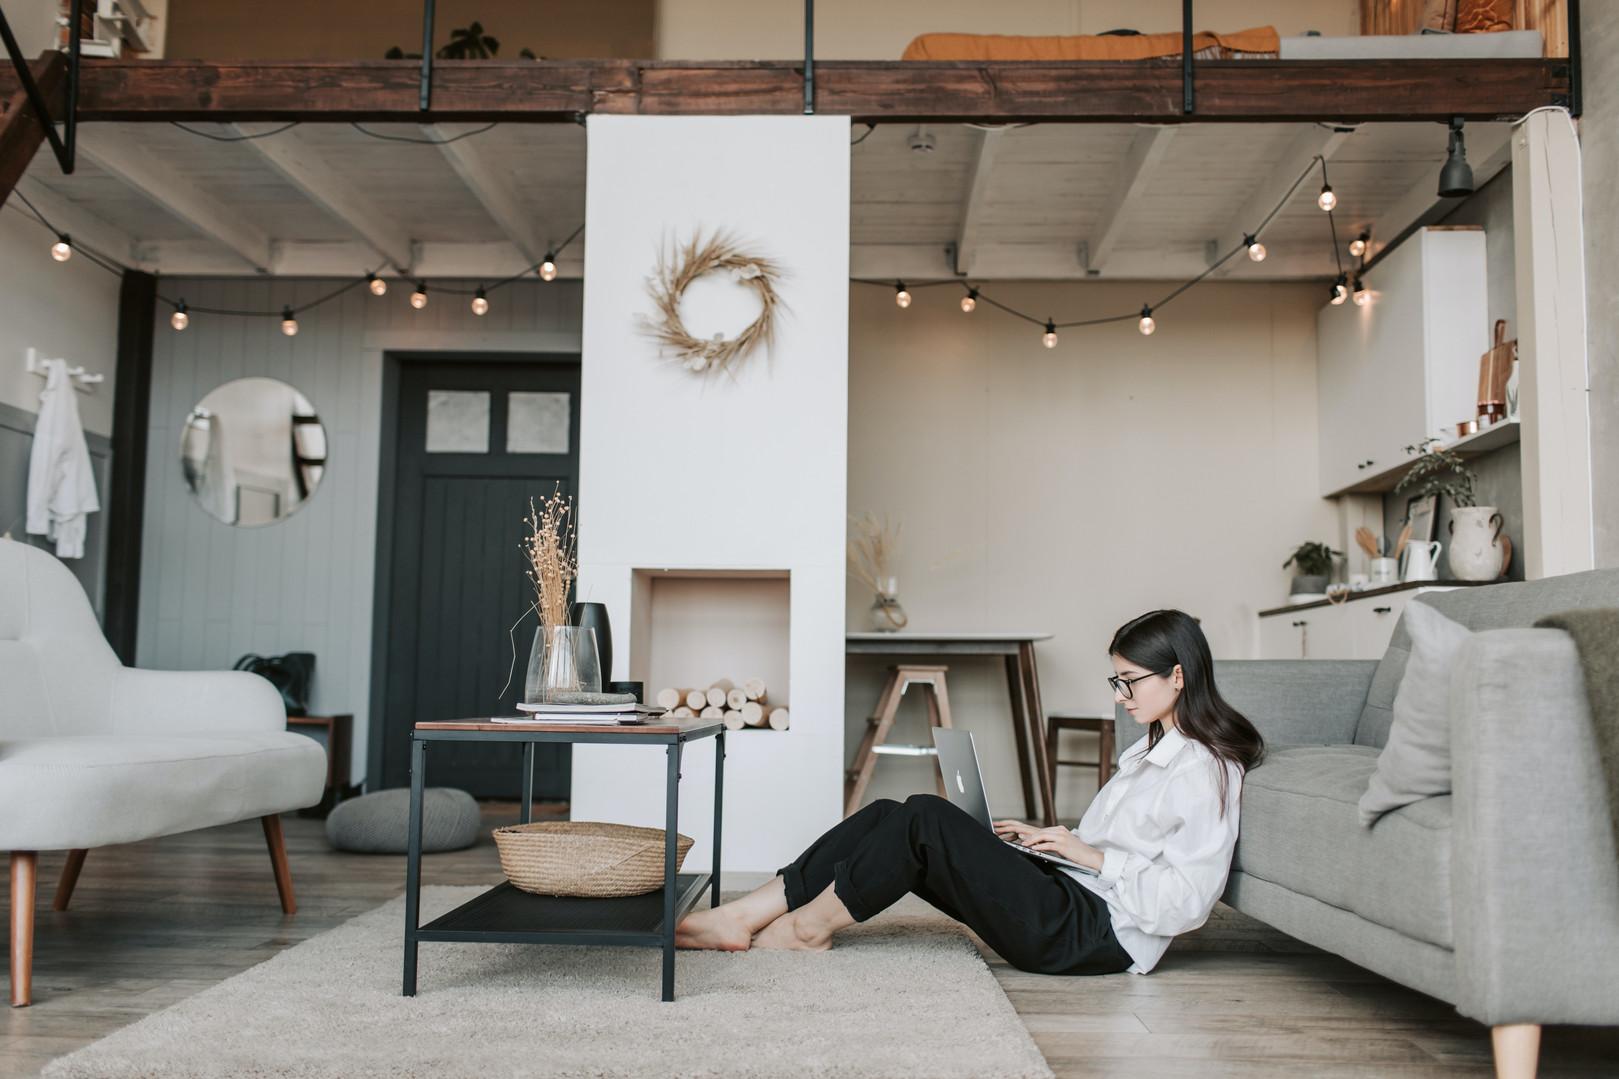 Home Office - Sitting on floor.jpg